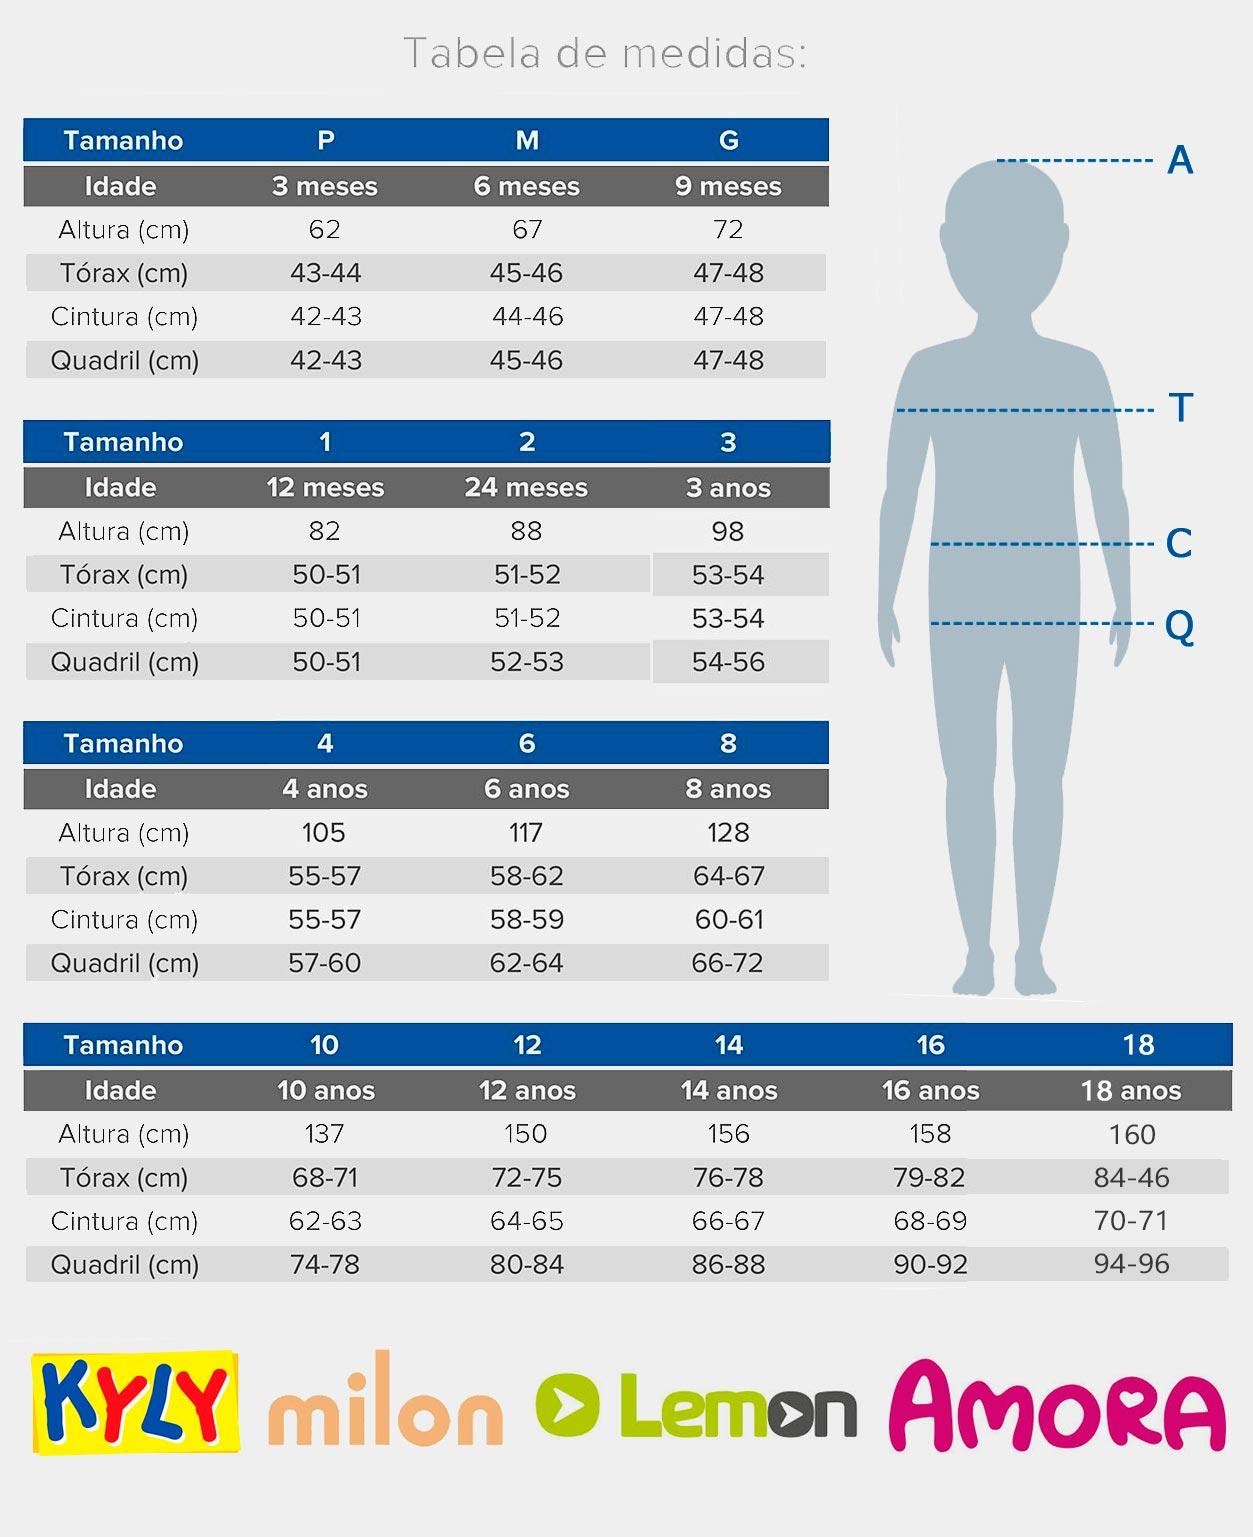 Pijama Infantil Feminino Anti-Mosquito Branco que Brilha no Escuro Inverno Kyly: Tabela de medidas